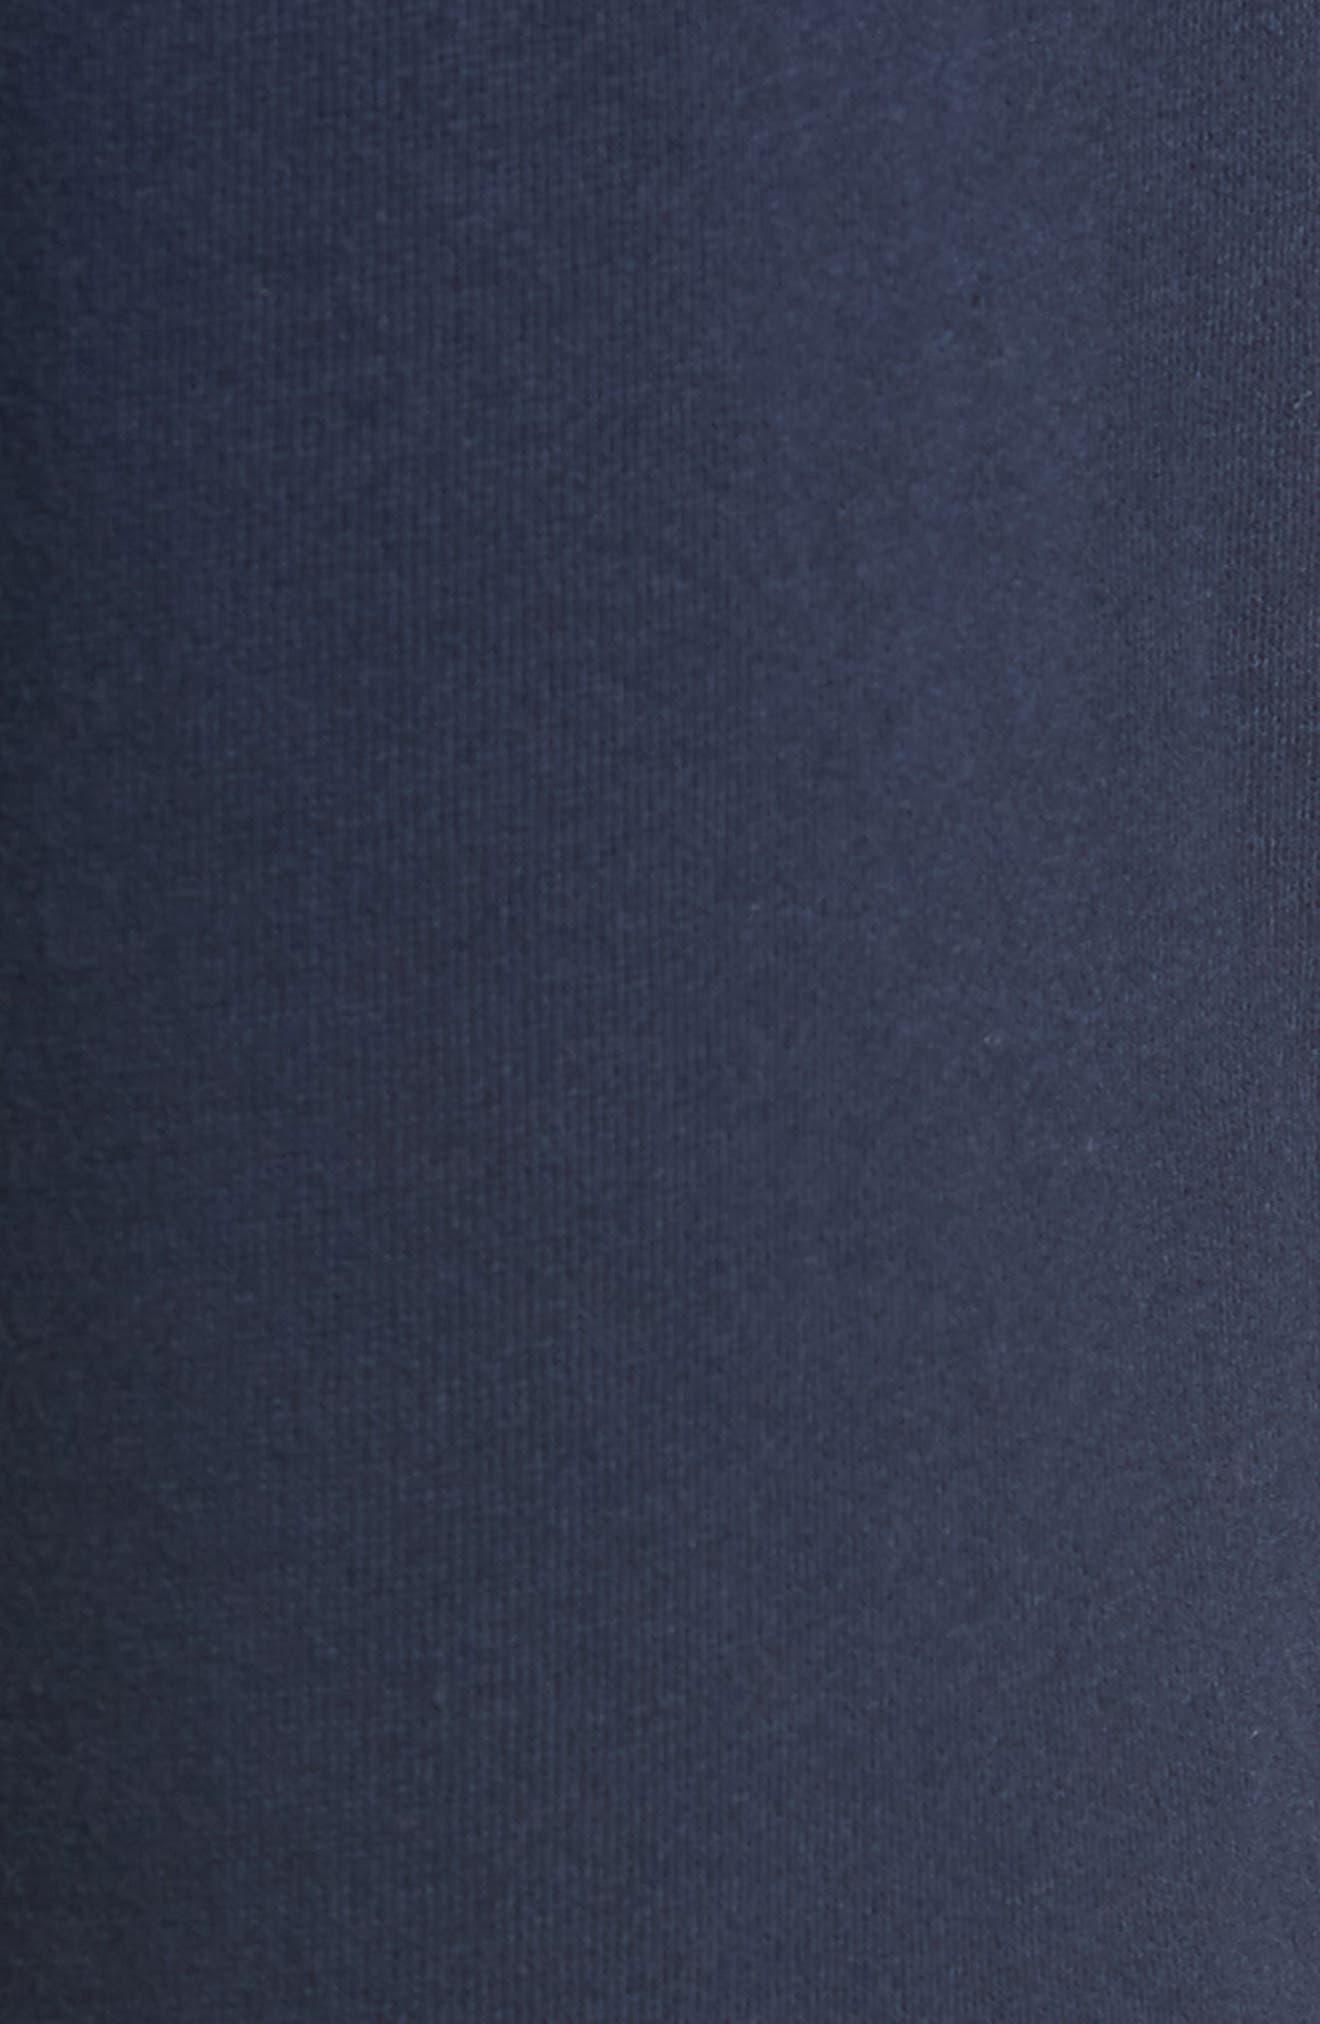 Crossed Sticks Fleece Sweatpants,                             Alternate thumbnail 5, color,                             401